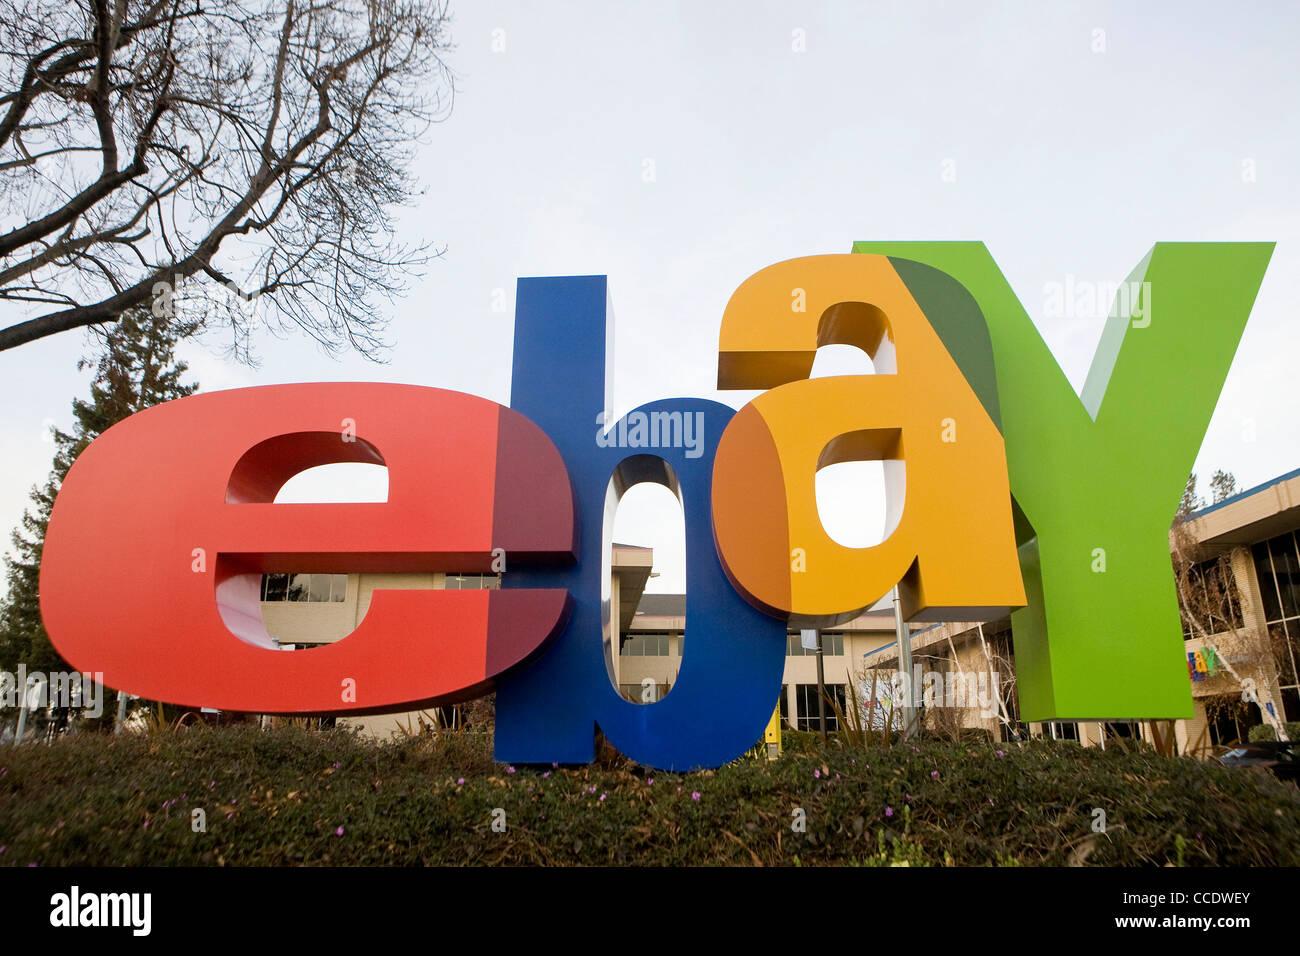 The headquarters of Ebay. - Stock Image